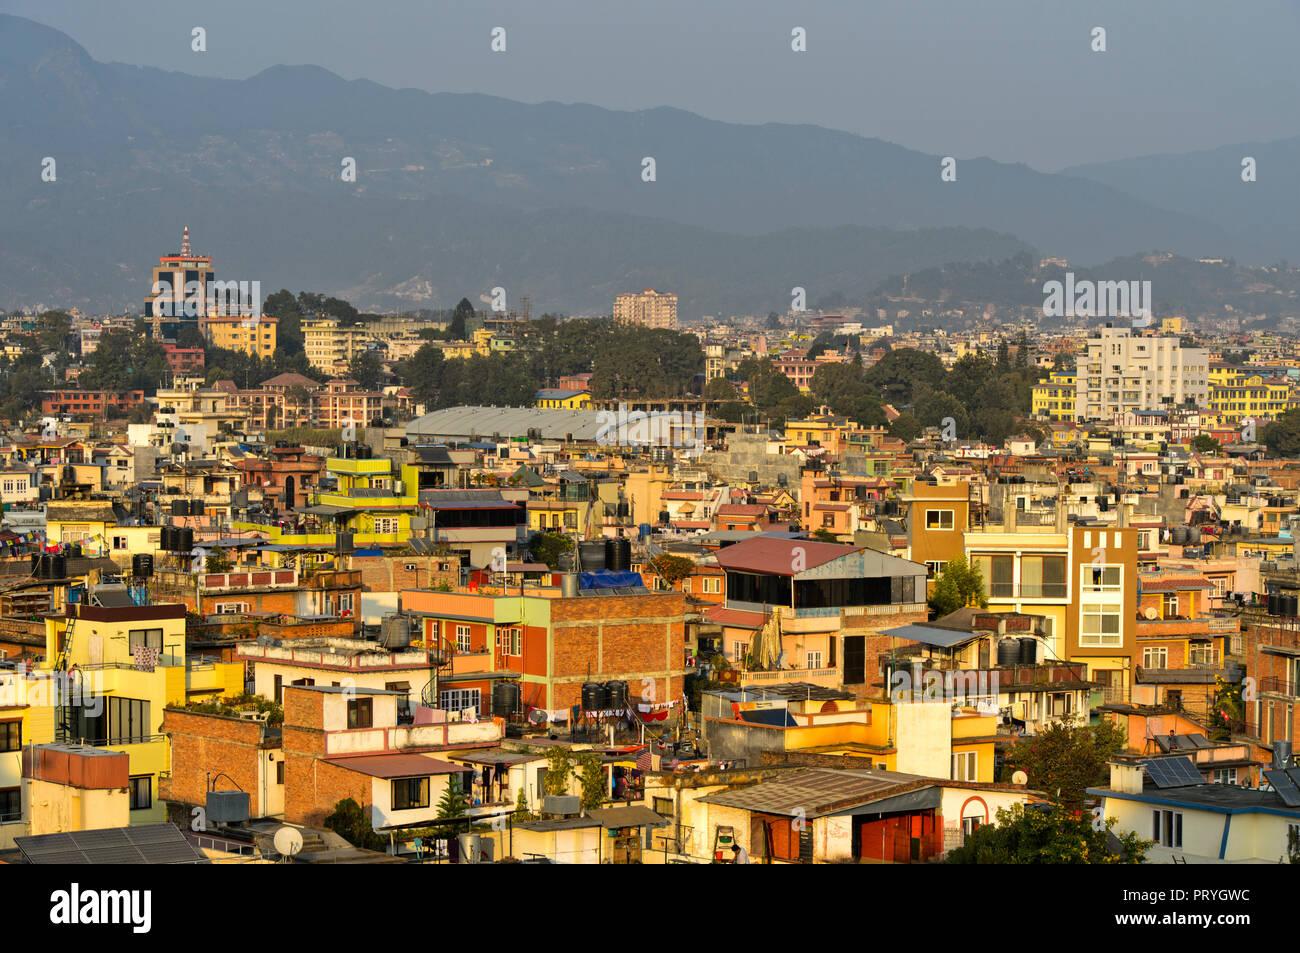 District Lazimpat, Kathmandu, Nepal - Stock Image